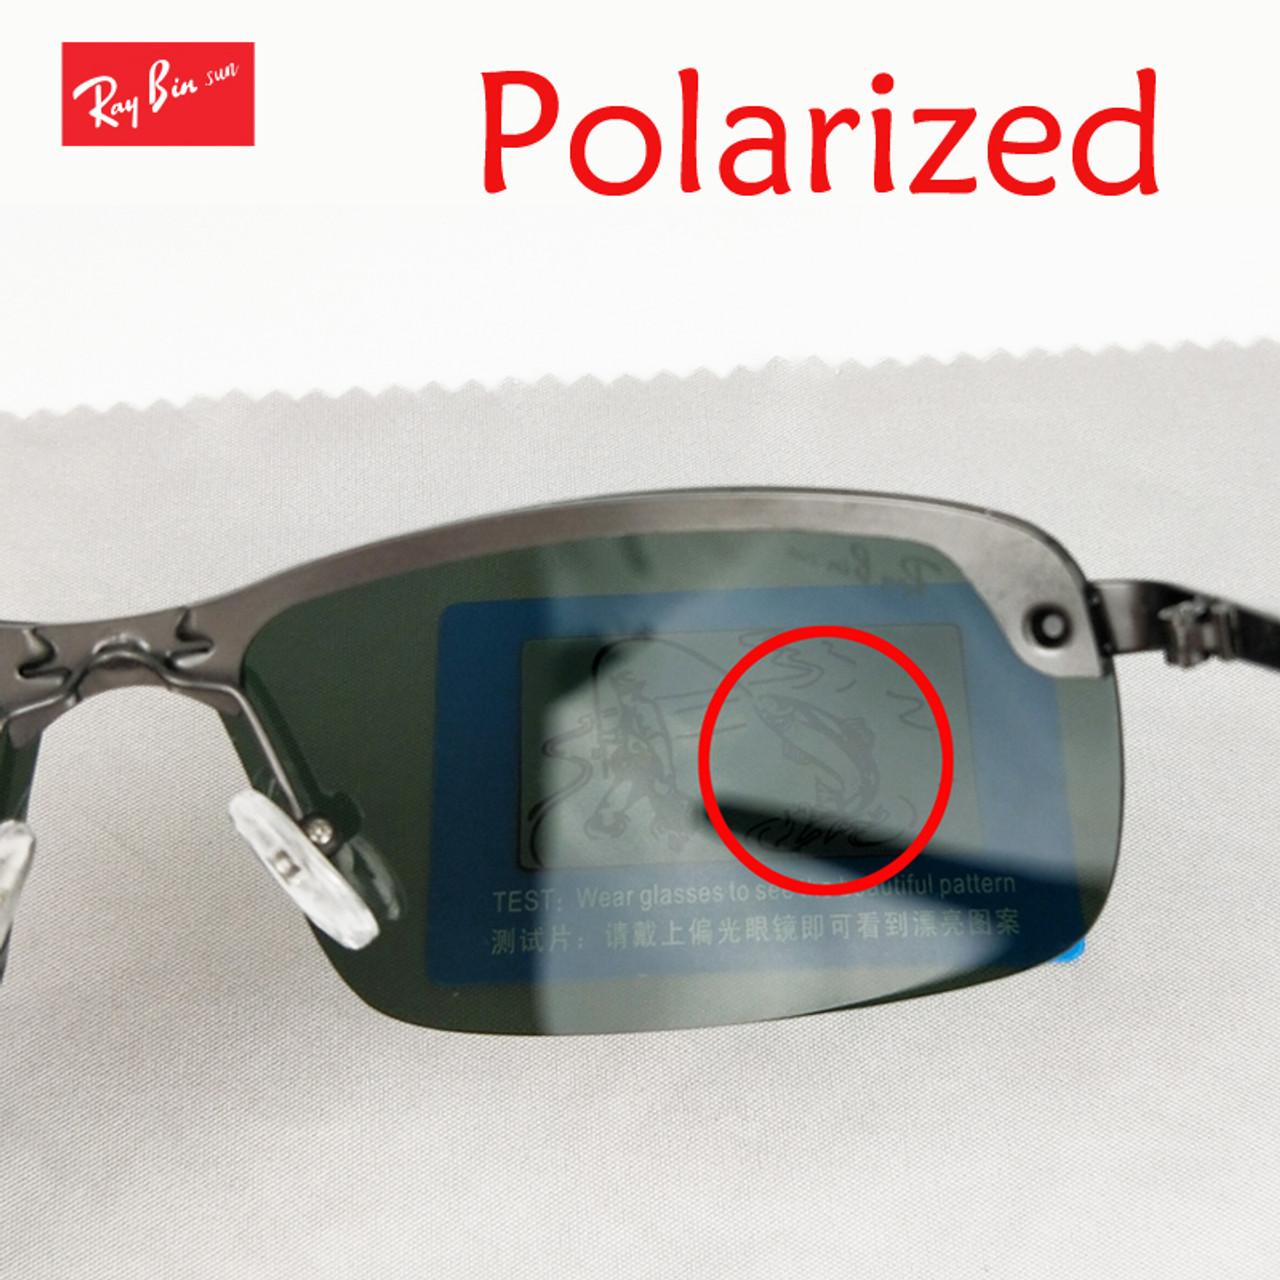 Ray Bin Sun sunglasses Brand Men's Women polarized Driving vintage  Sunglasses fashion square Black sport Goggle sun glasses - OnshopDeals.Com